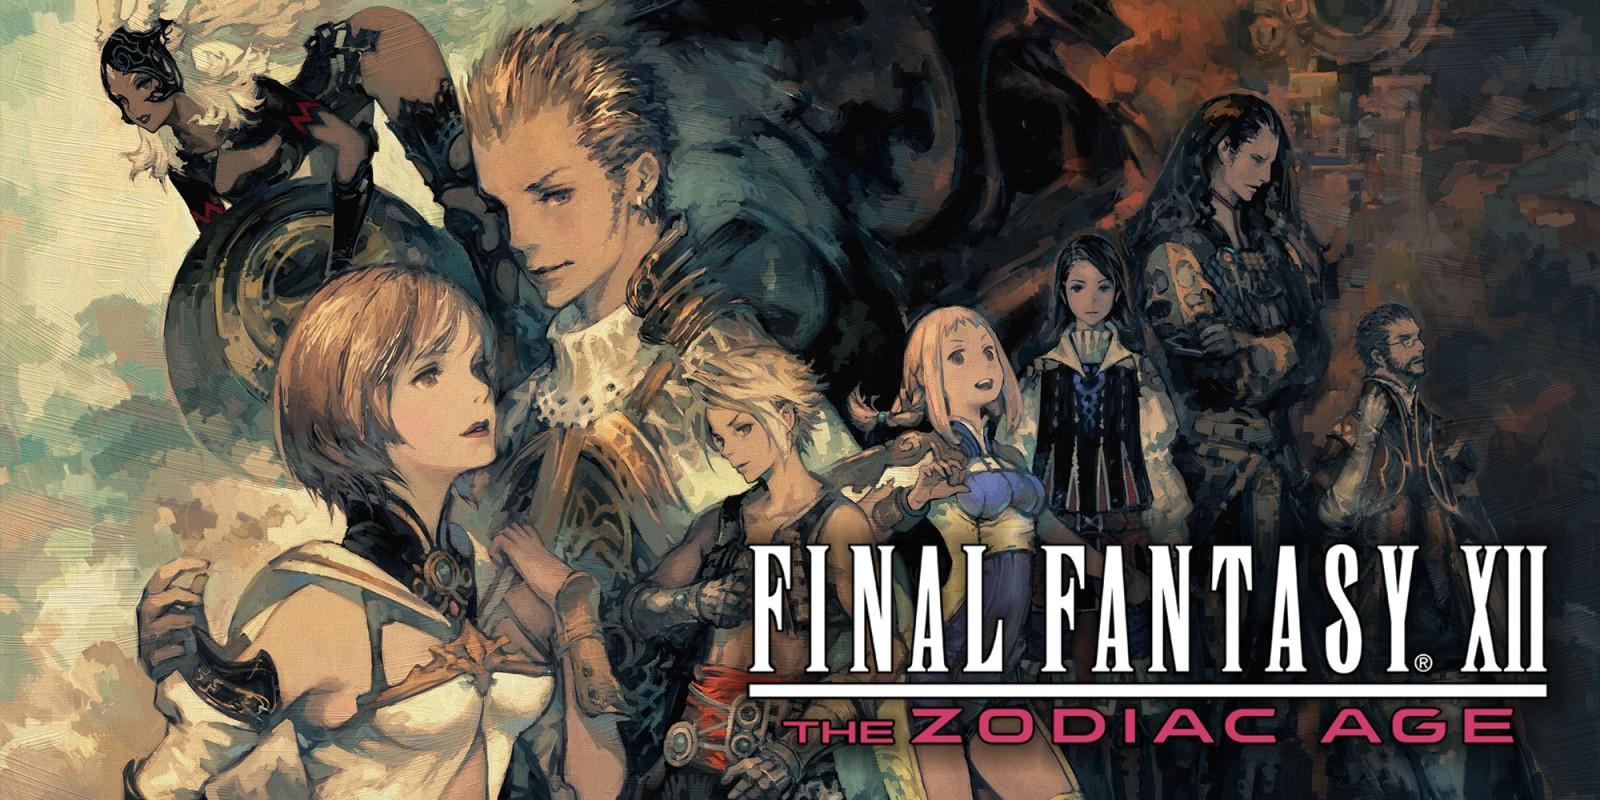 Análise: Final Fantasy XII: The Zodiac Age (Switch) - a melhor ...